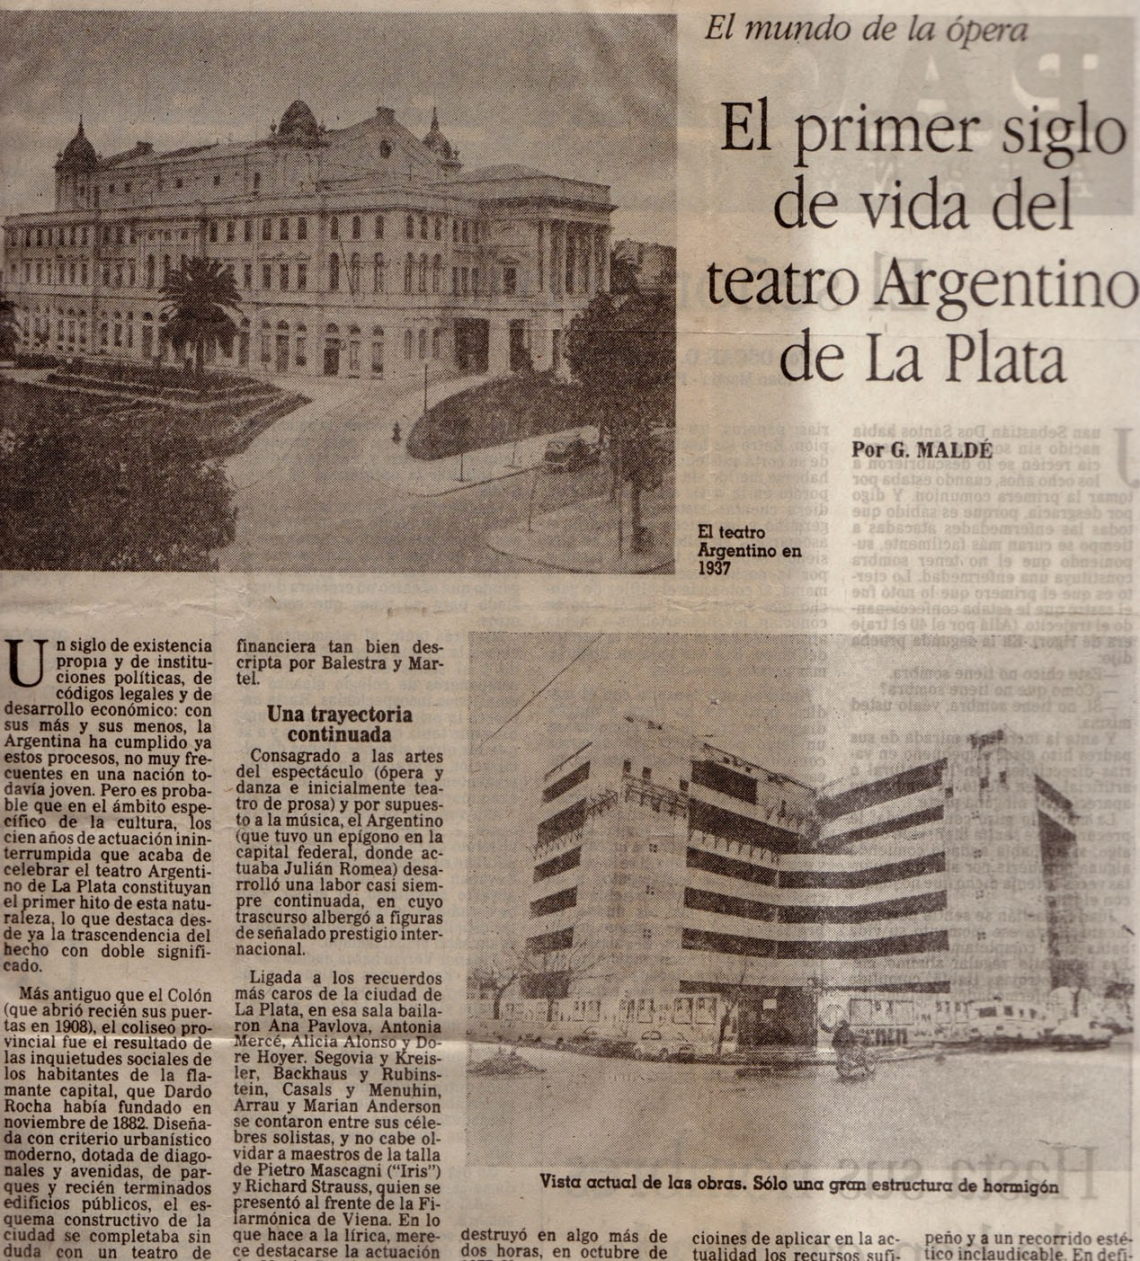 0-1990-12-09-diario-la-prensa-el-primer-siglo-de-vida-del-ta.jpg